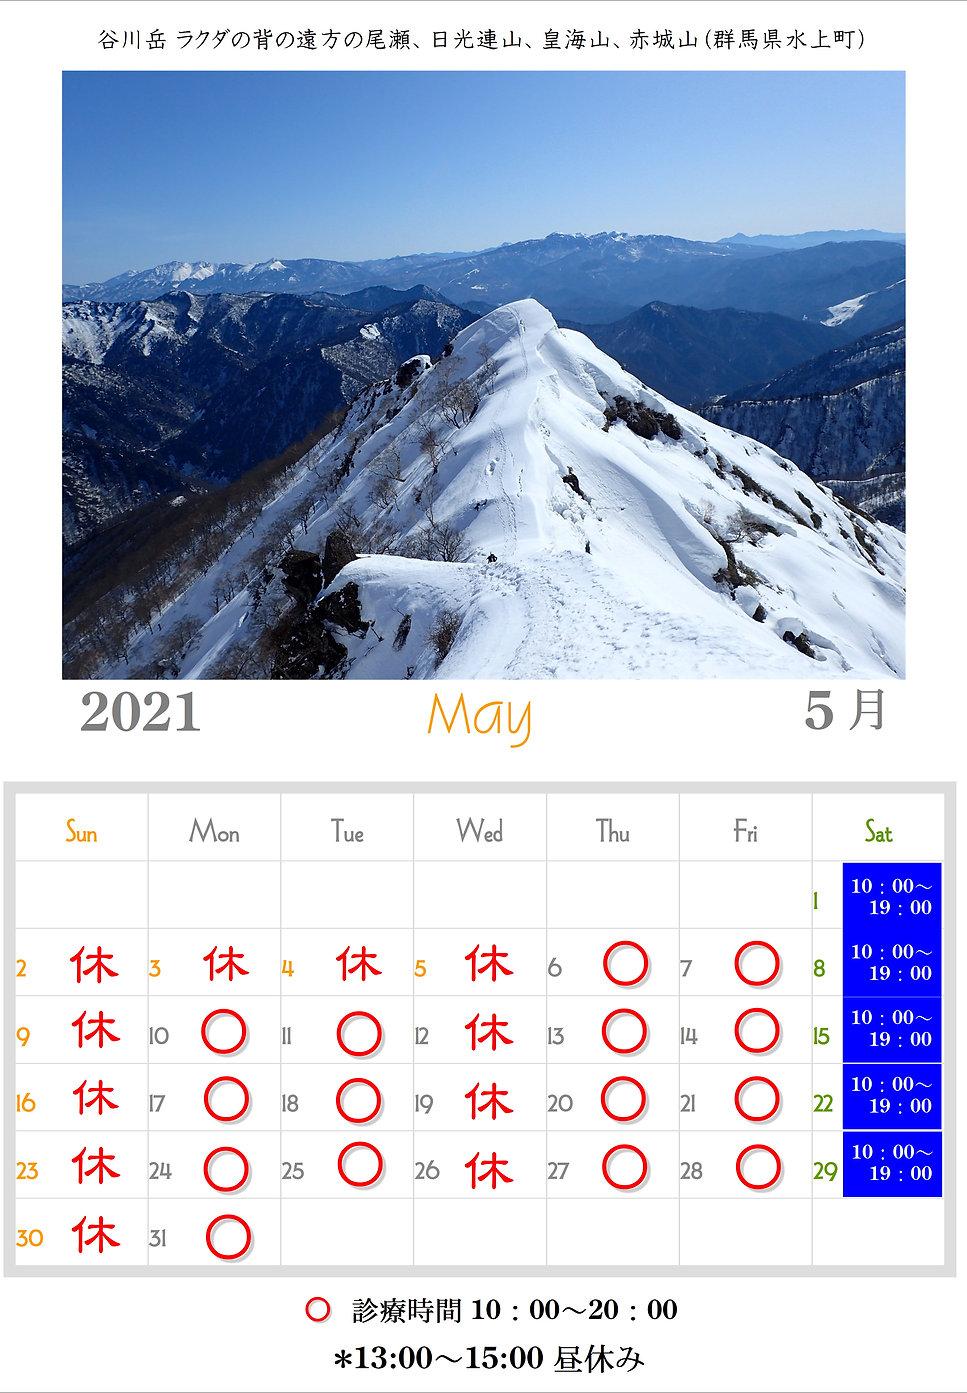 wix谷川岳 ラクダの背の遠方の尾瀬、日光連山、皇海山、赤城山(群馬県水上町).